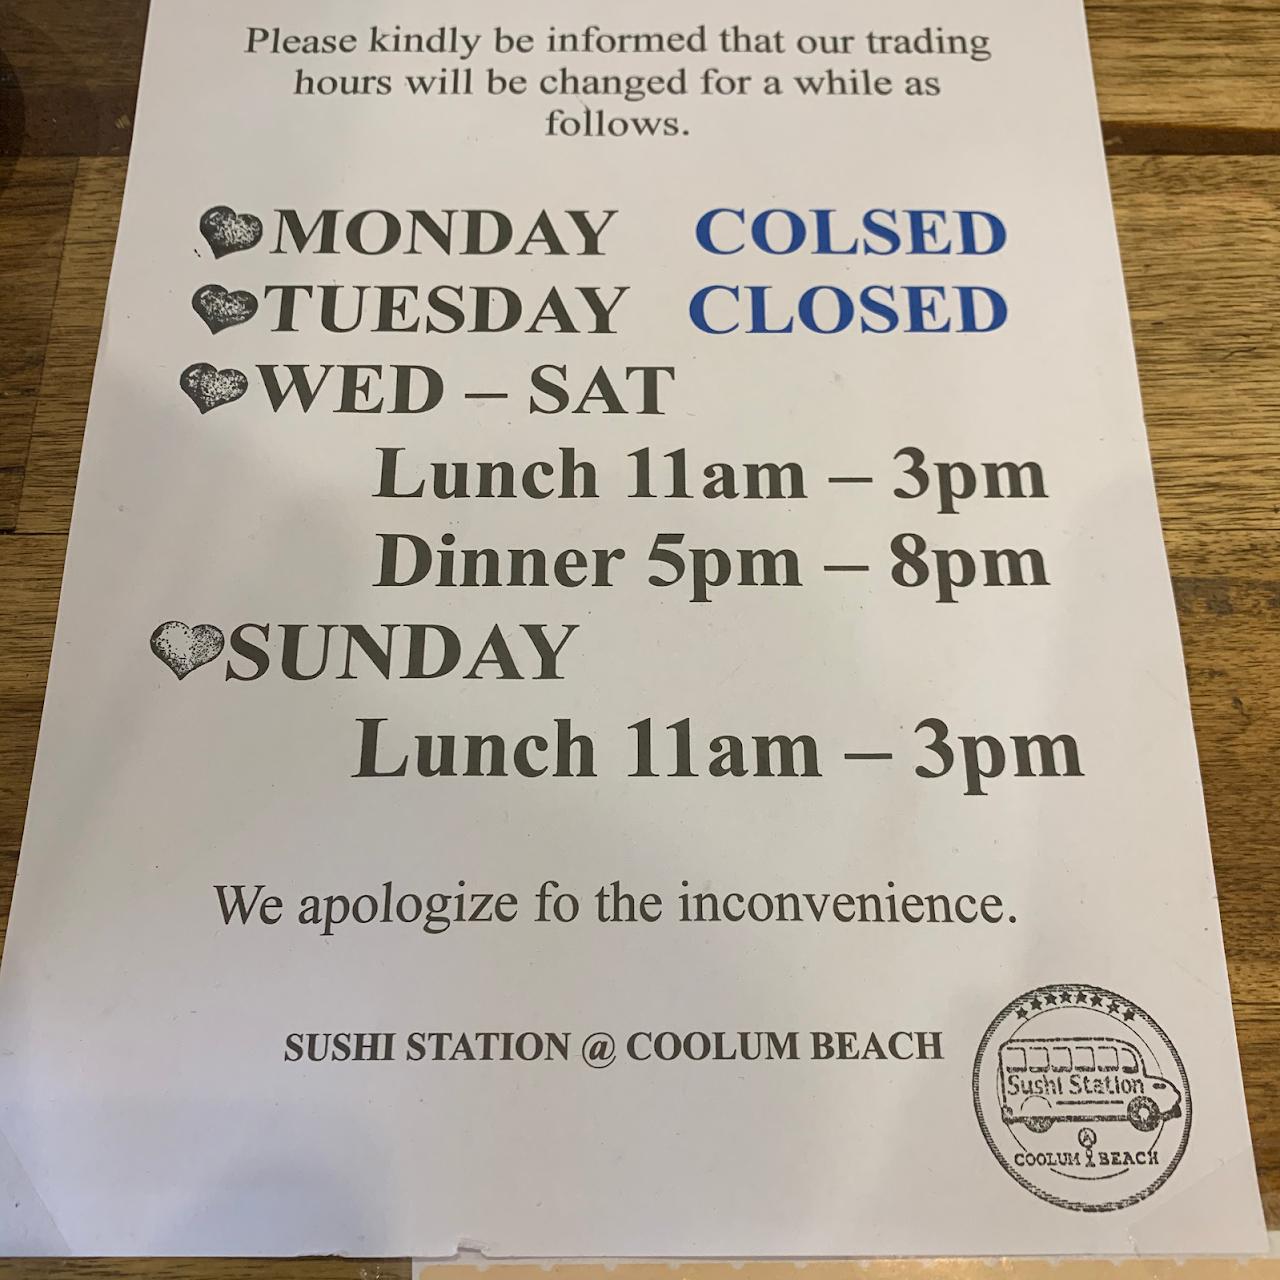 Sushi Station Coolum Beach Coolum Beachの寿司店 Platus asortimentas, galimybė užsisakyti iš anksto. sushi station coolum beach business site